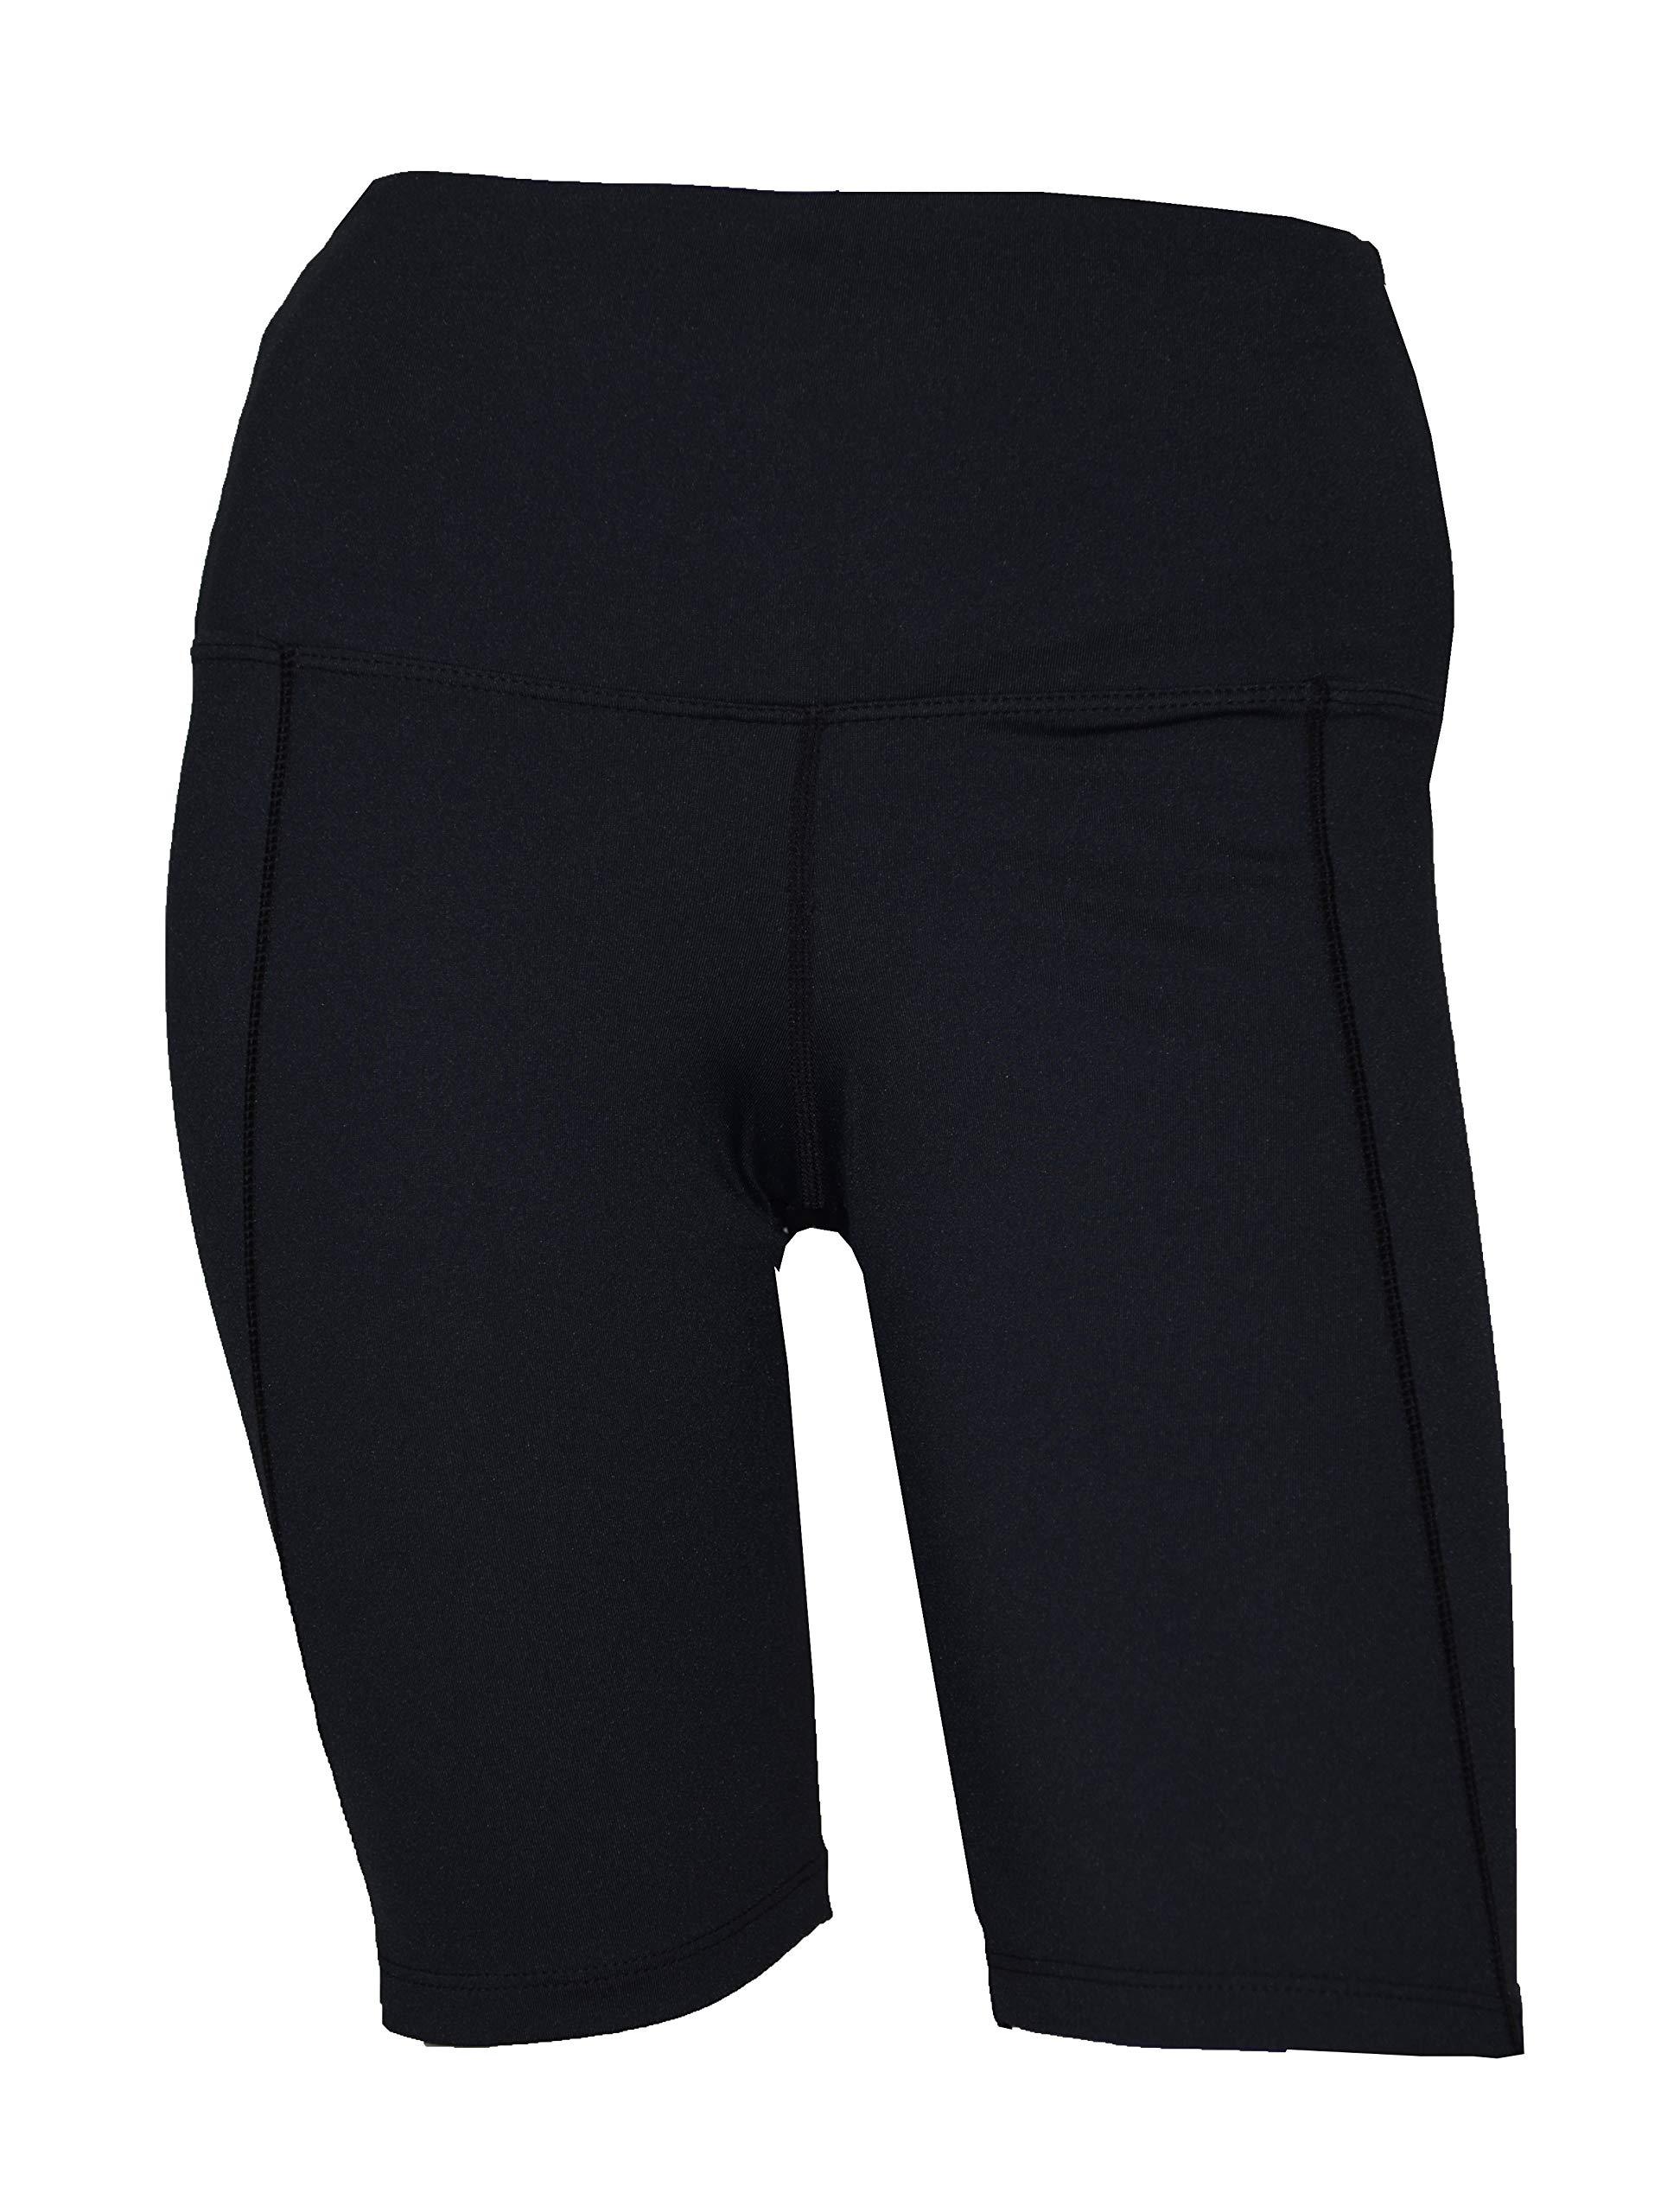 Private Island Women UV Swim Rash Guard Pocket Shorts Pants Yoga (M, Black) by Private Island